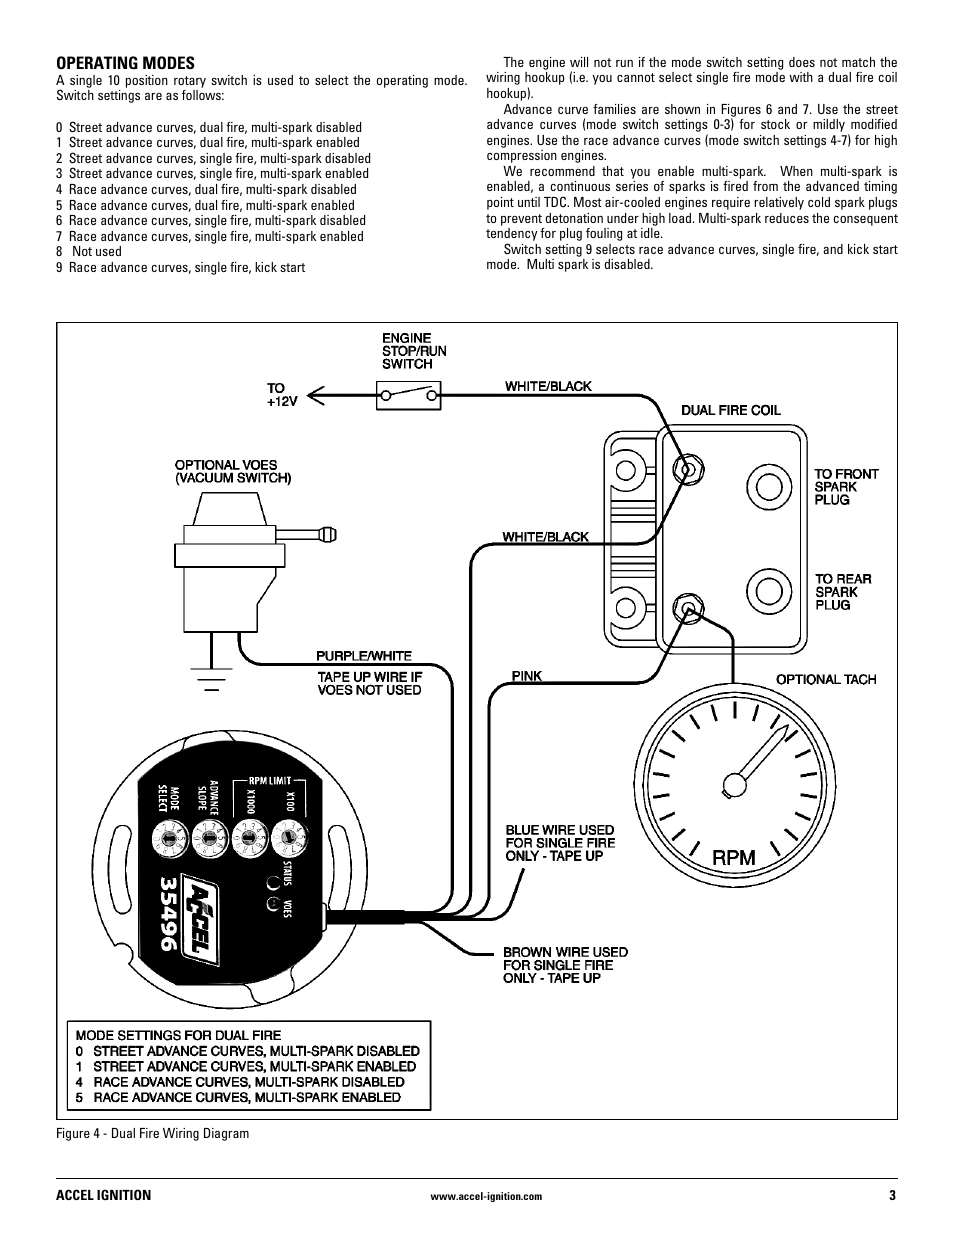 Jacobs Ultra Coil Wiring Diagram Harley Coil Wiring Raymondmedia Co  sc 1 st  gojono.com : 12v ignition coil wiring - yogabreezes.com